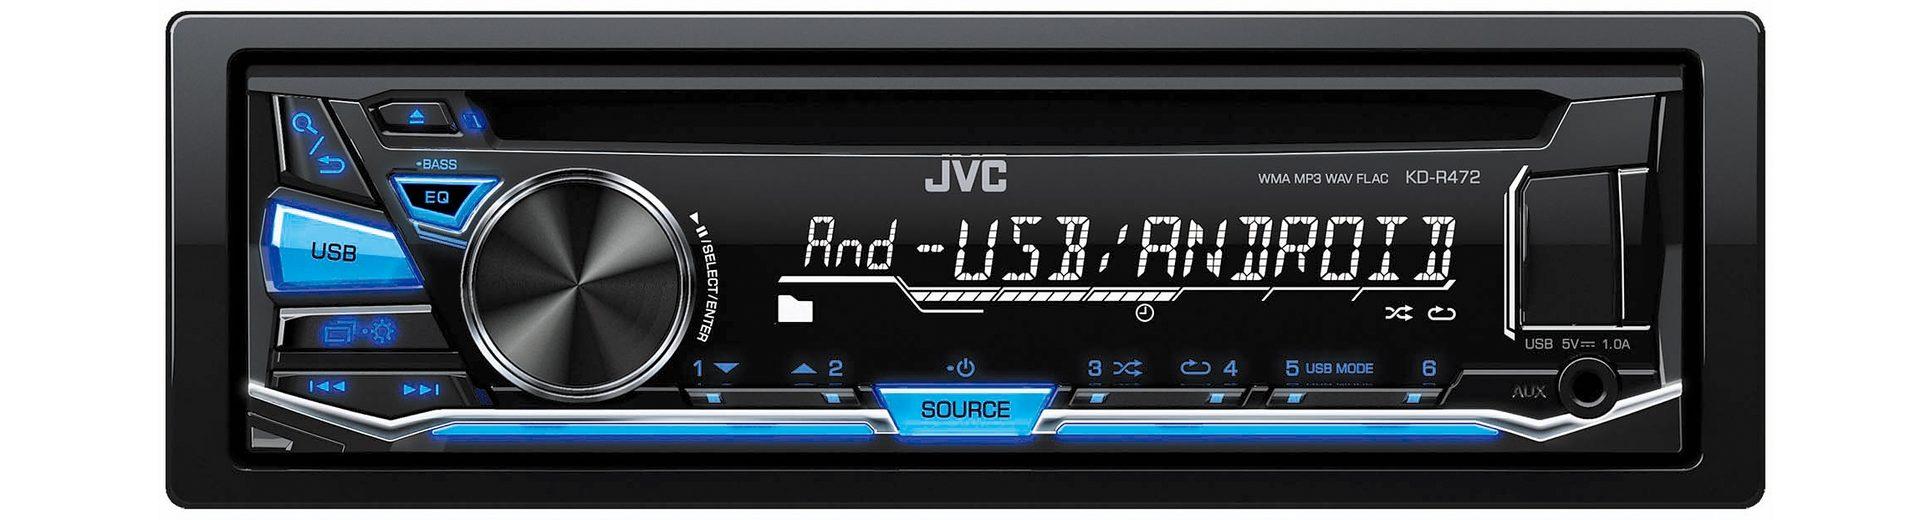 JVC 1-DIN CD-Receiver »KD-R472E«